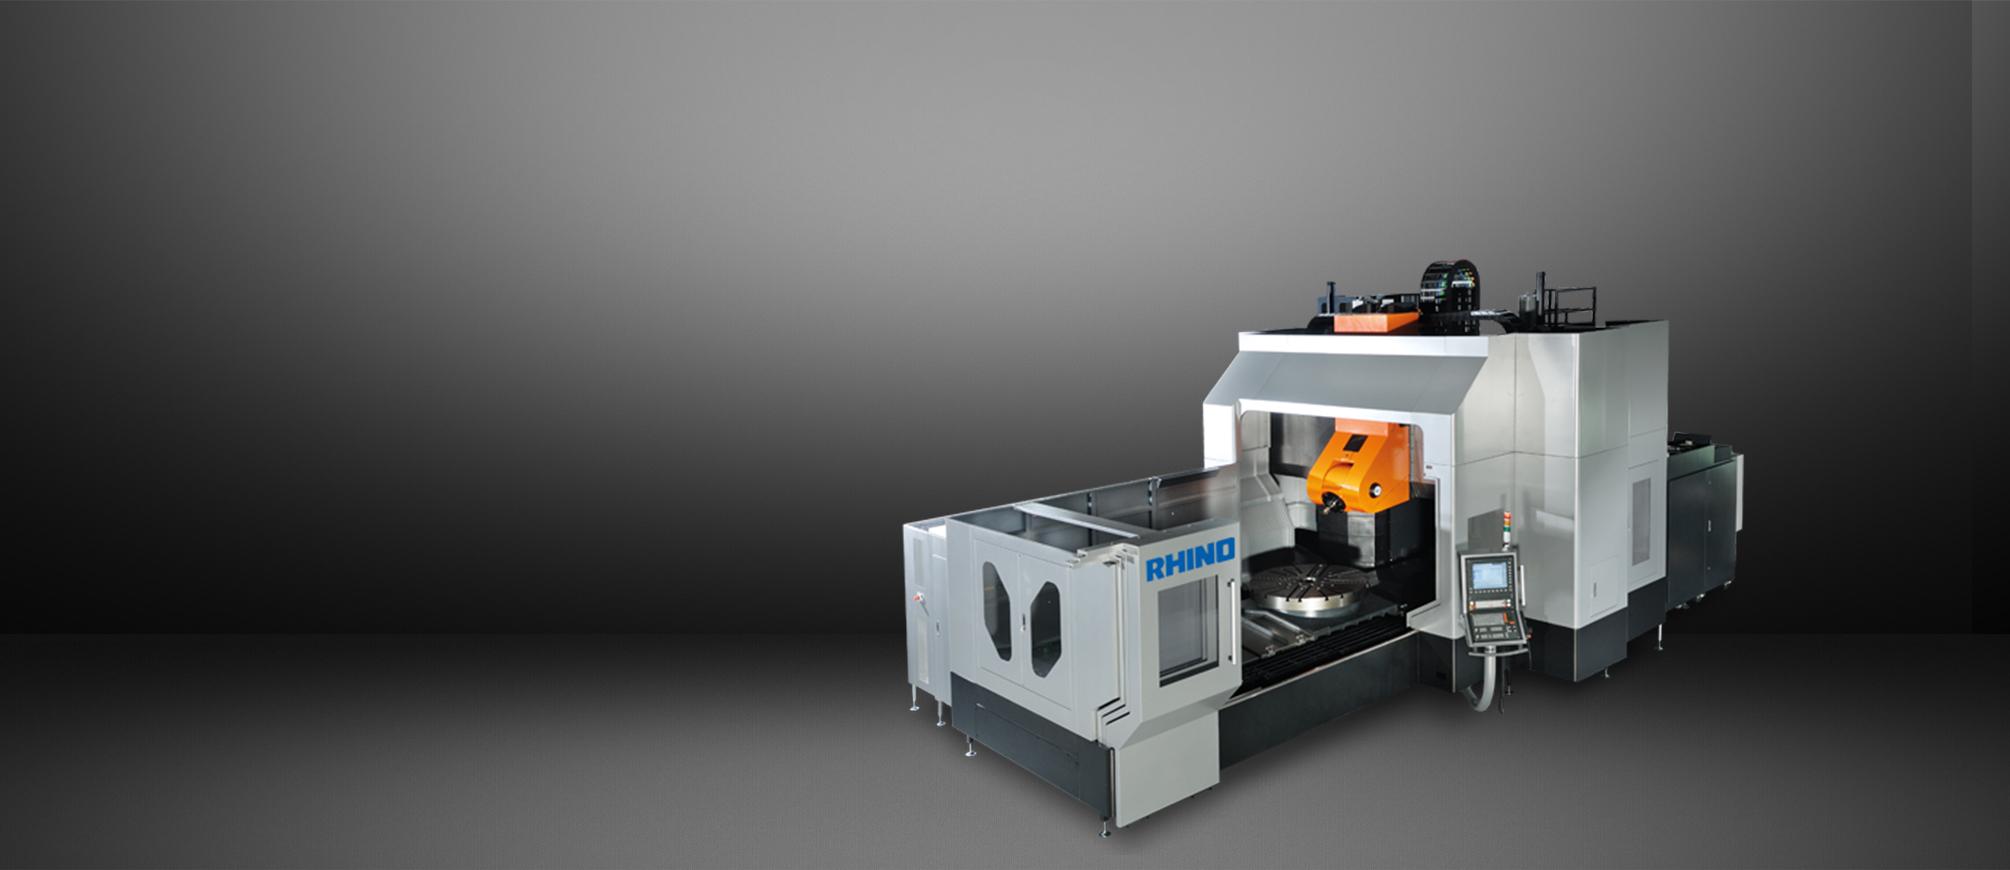 RHINO 1250 Linear Motor 5 Axis